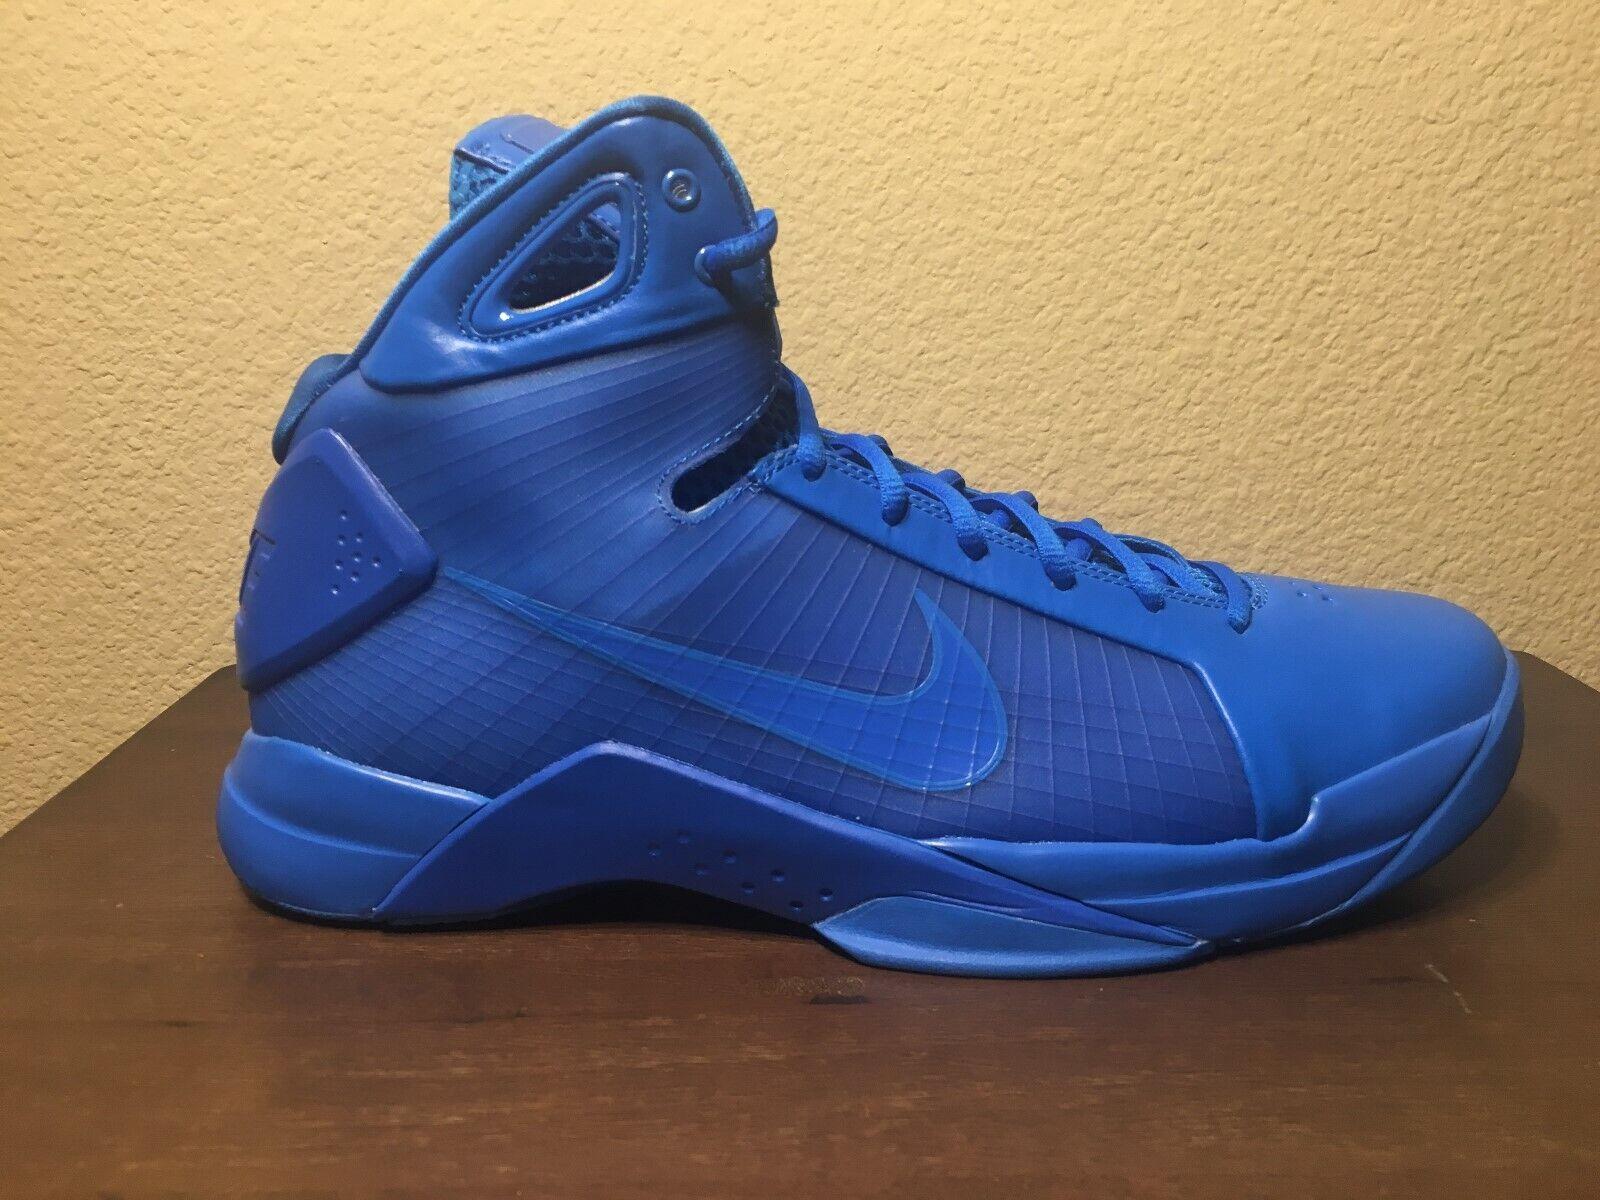 Nike Hyperdunk Retro '08 Mens Mens Mens Photo bluee Basketball shoes {820321-400} Sz 12 220741